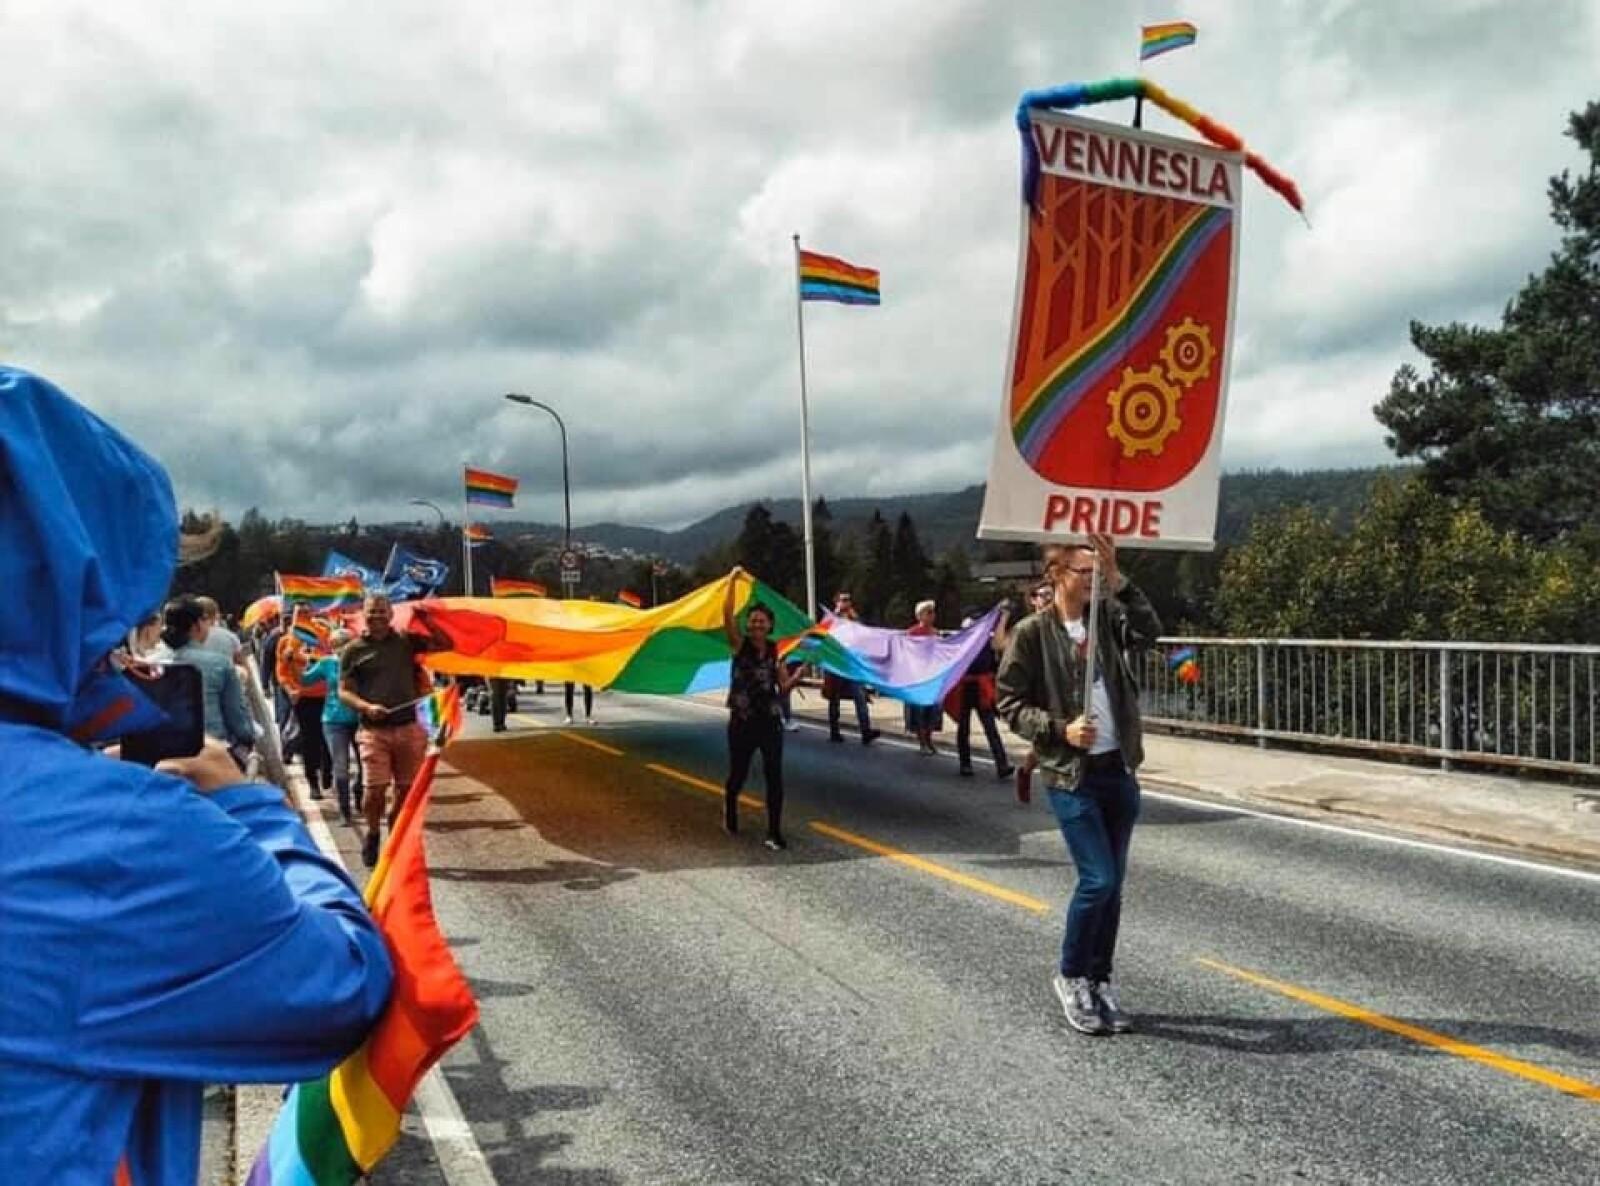 Vennesla Pride.